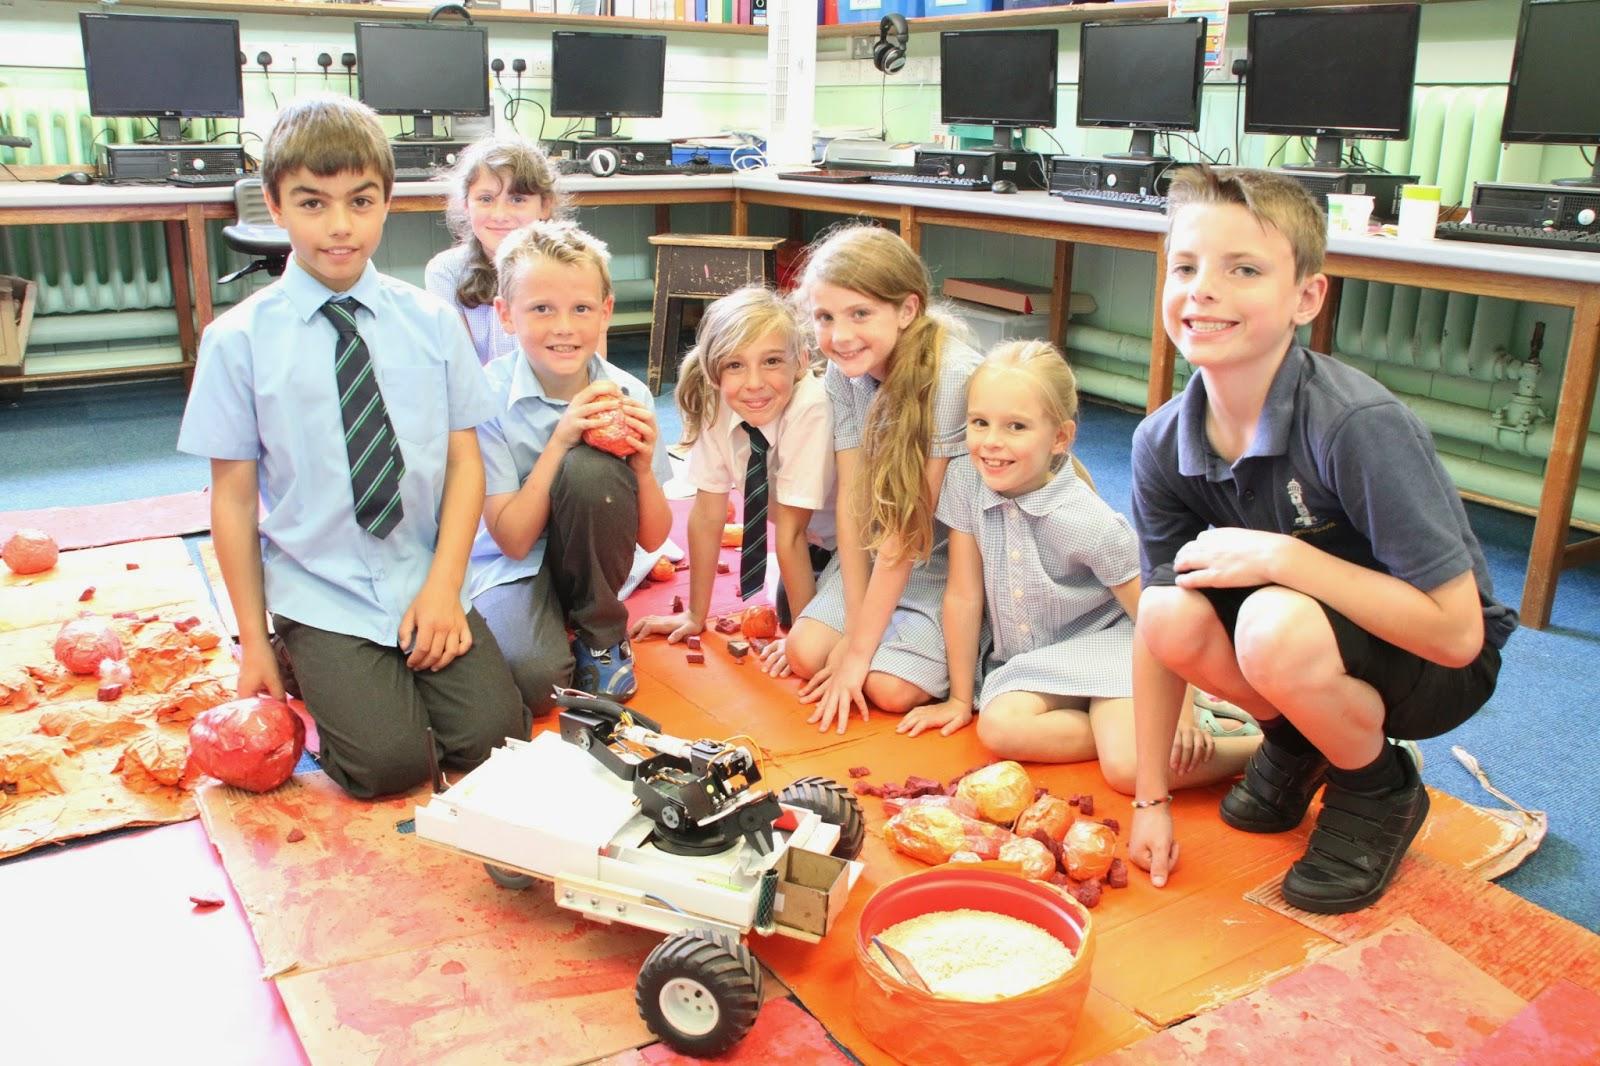 mars rover school project - photo #16